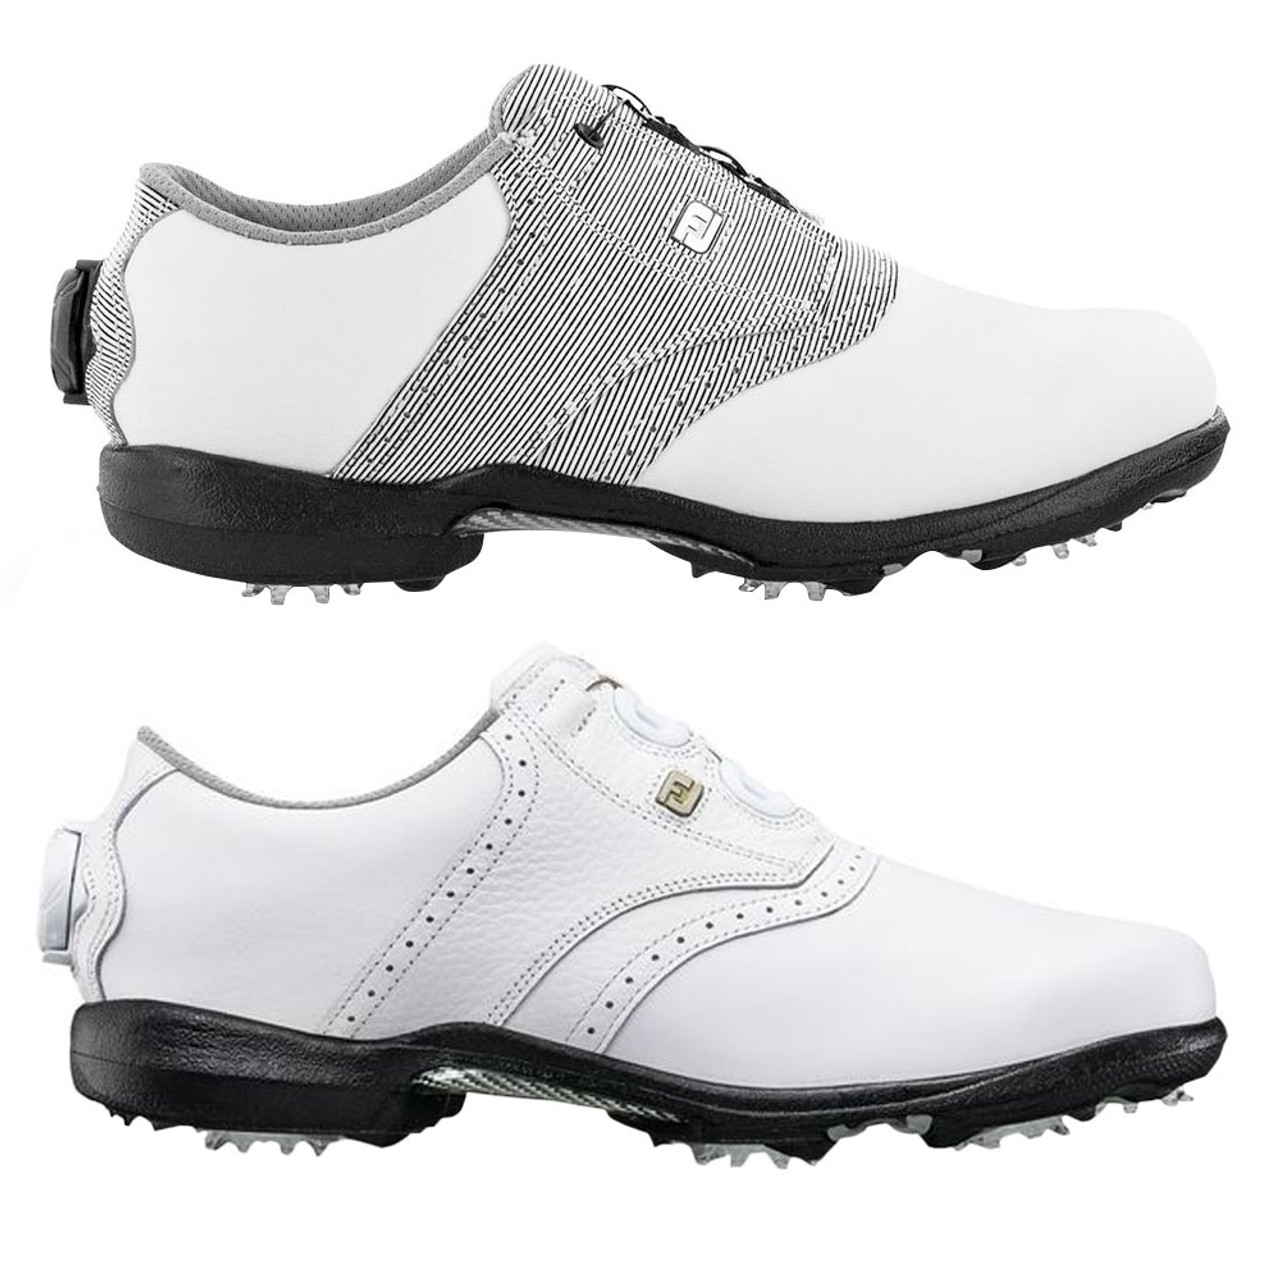 footjoy boa ladies golf sko order f4b12